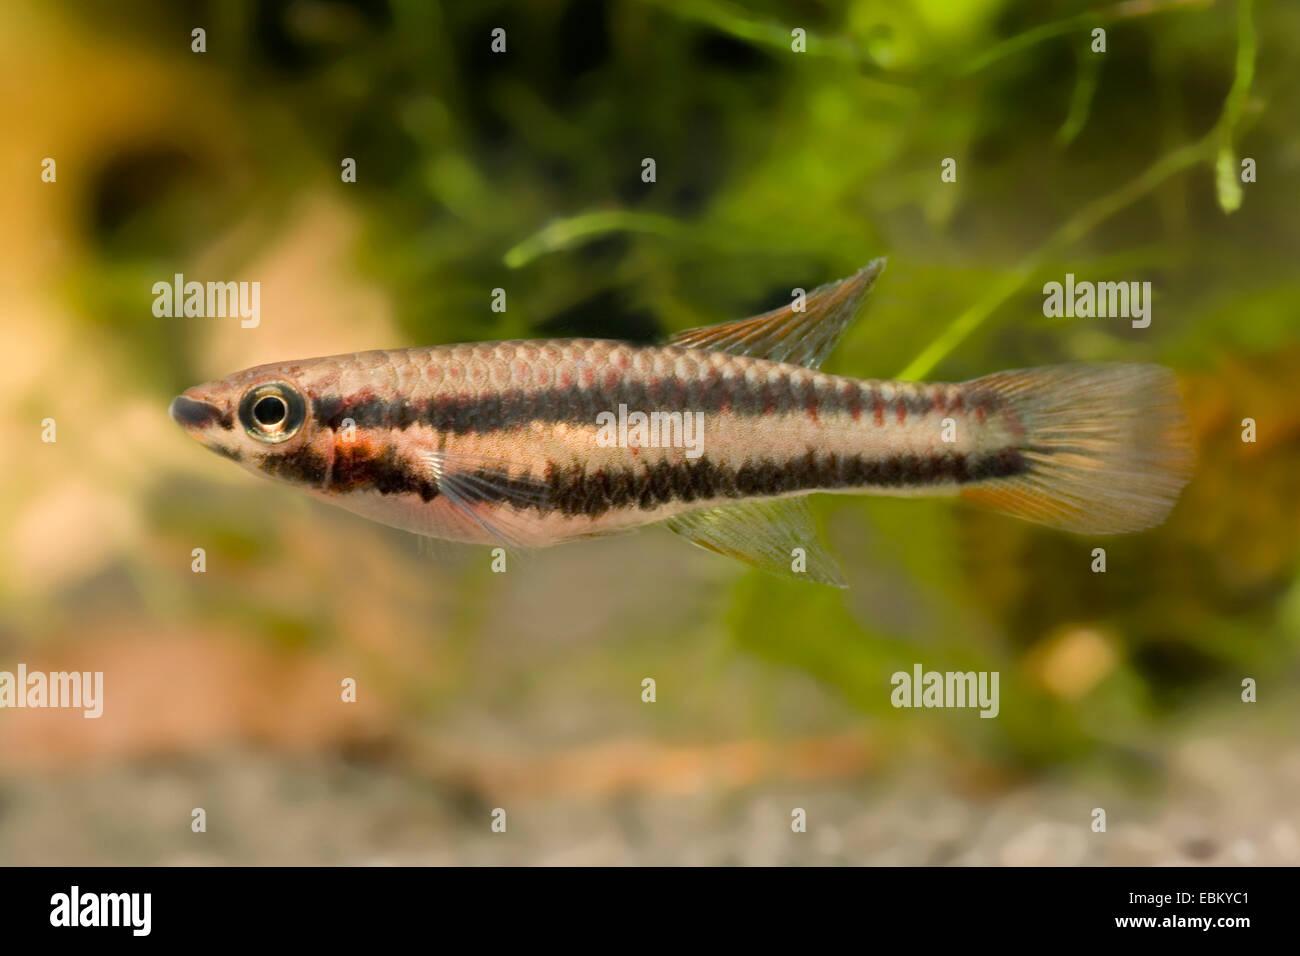 Deux-bagué, Killi Killi à rayures (Aphyosemion bivittatum), natation Photo Stock